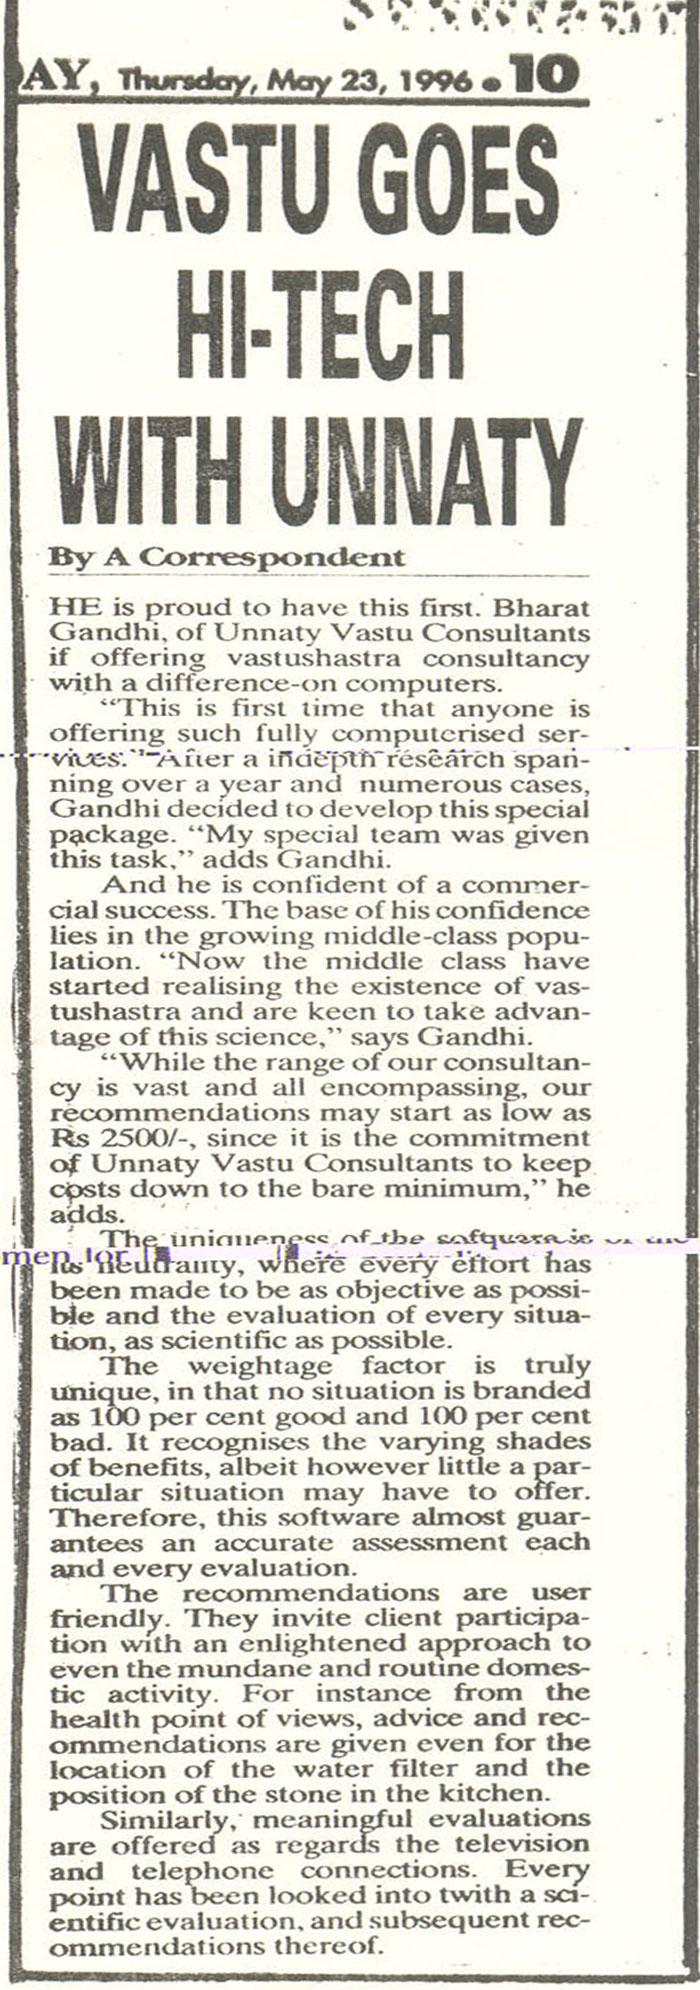 Vastu Goes Hi Tech With Unnaty